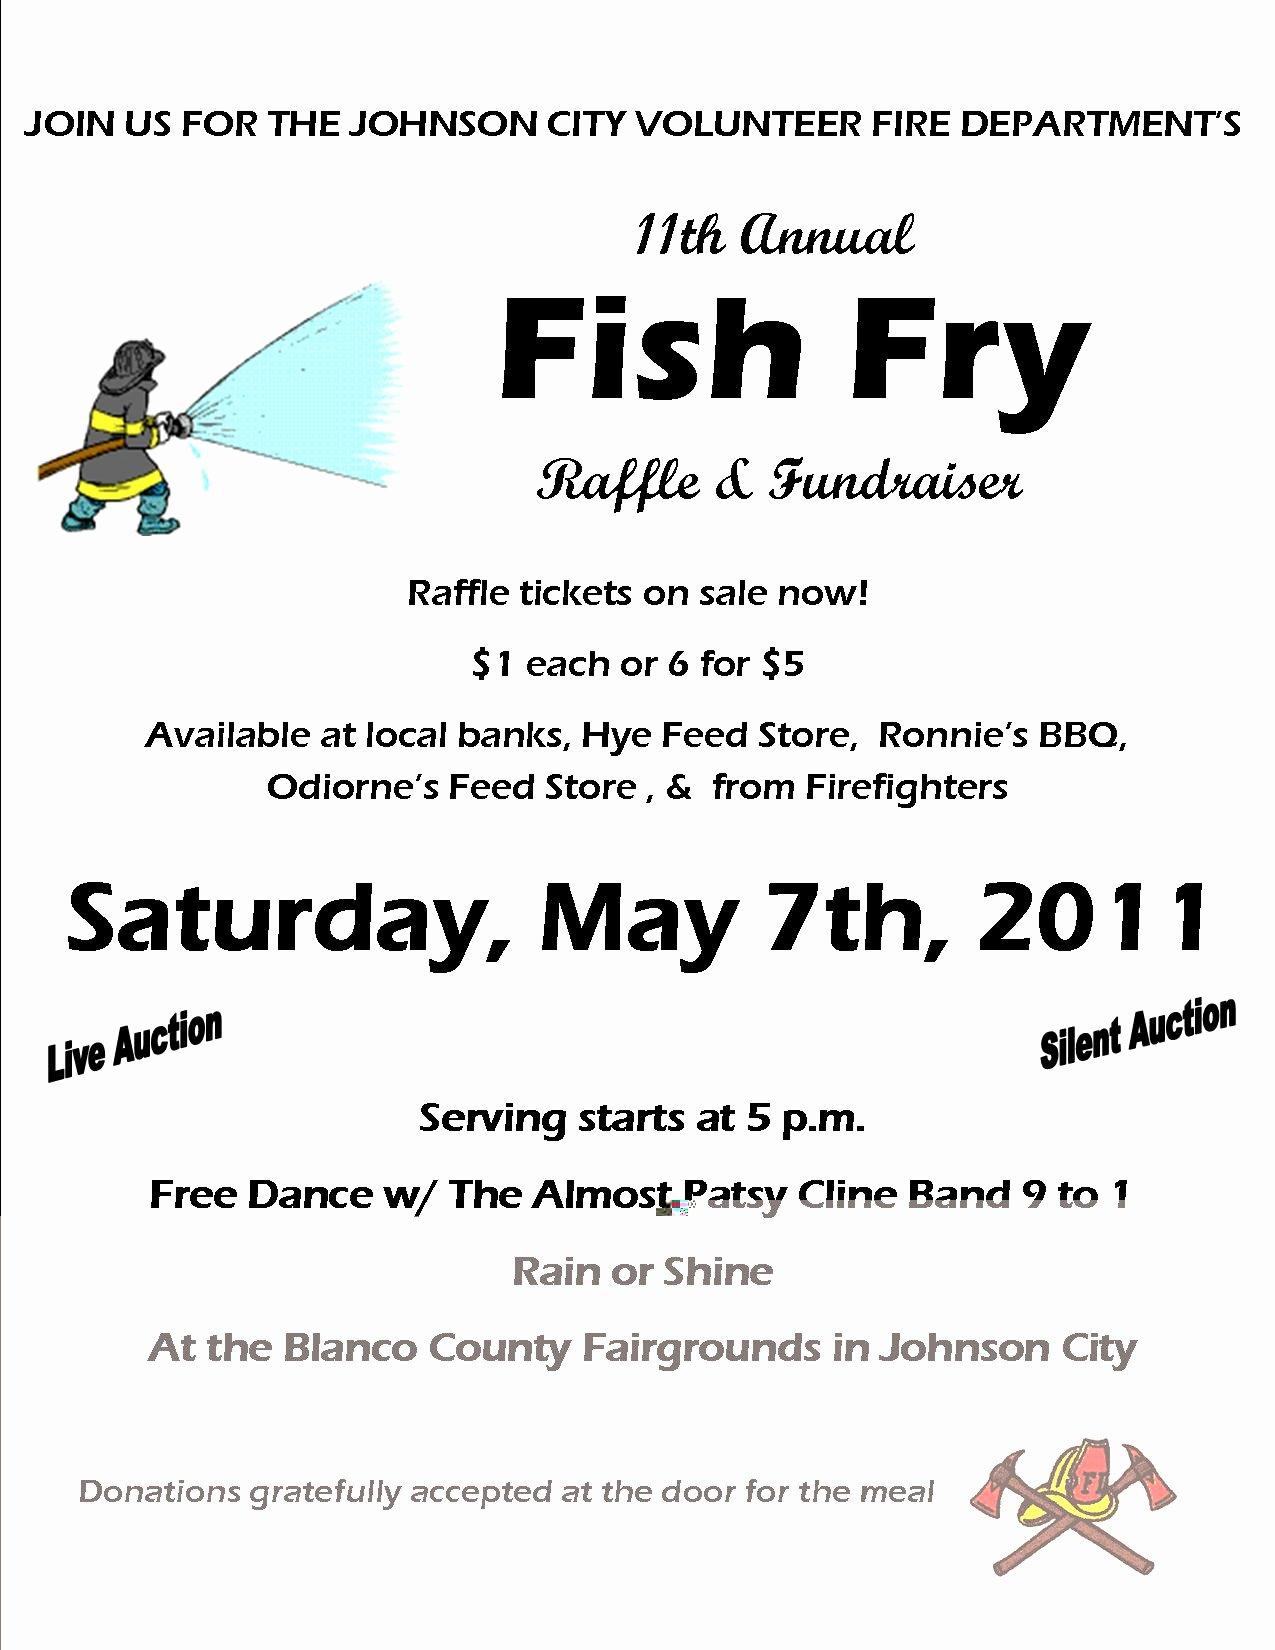 2011 Fish Fry Flyer Jcvfd